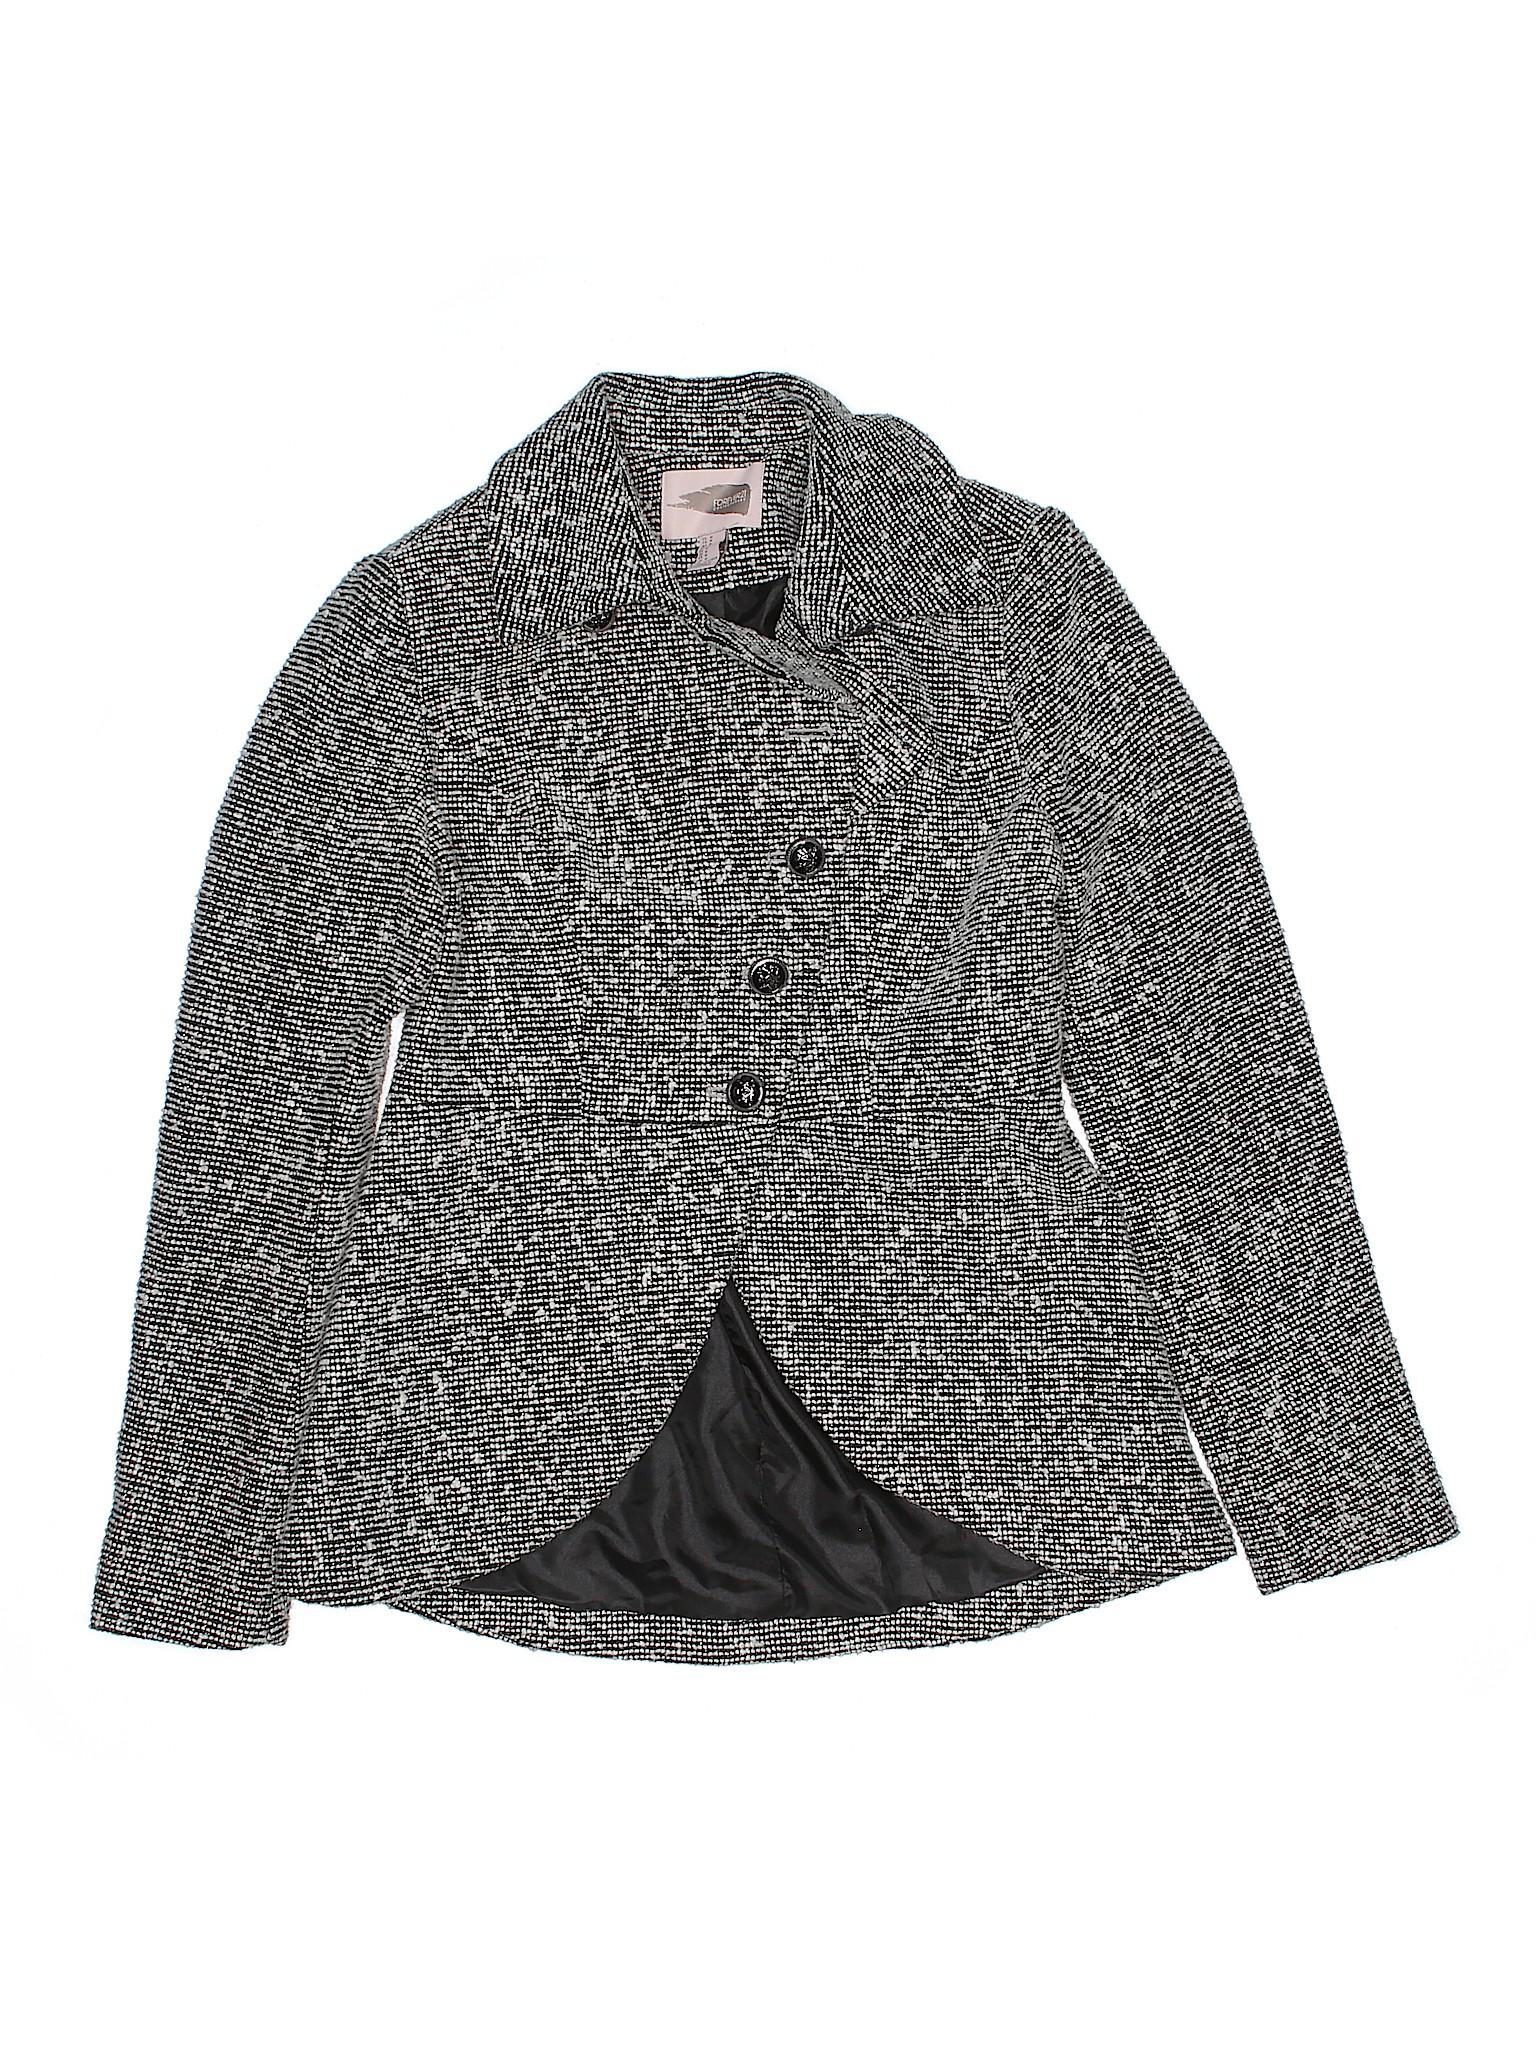 Jacket Jacket Boutique 21 Jacket Forever winter Boutique 21 Forever winter Boutique Boutique winter Forever 21 tw6gngq1